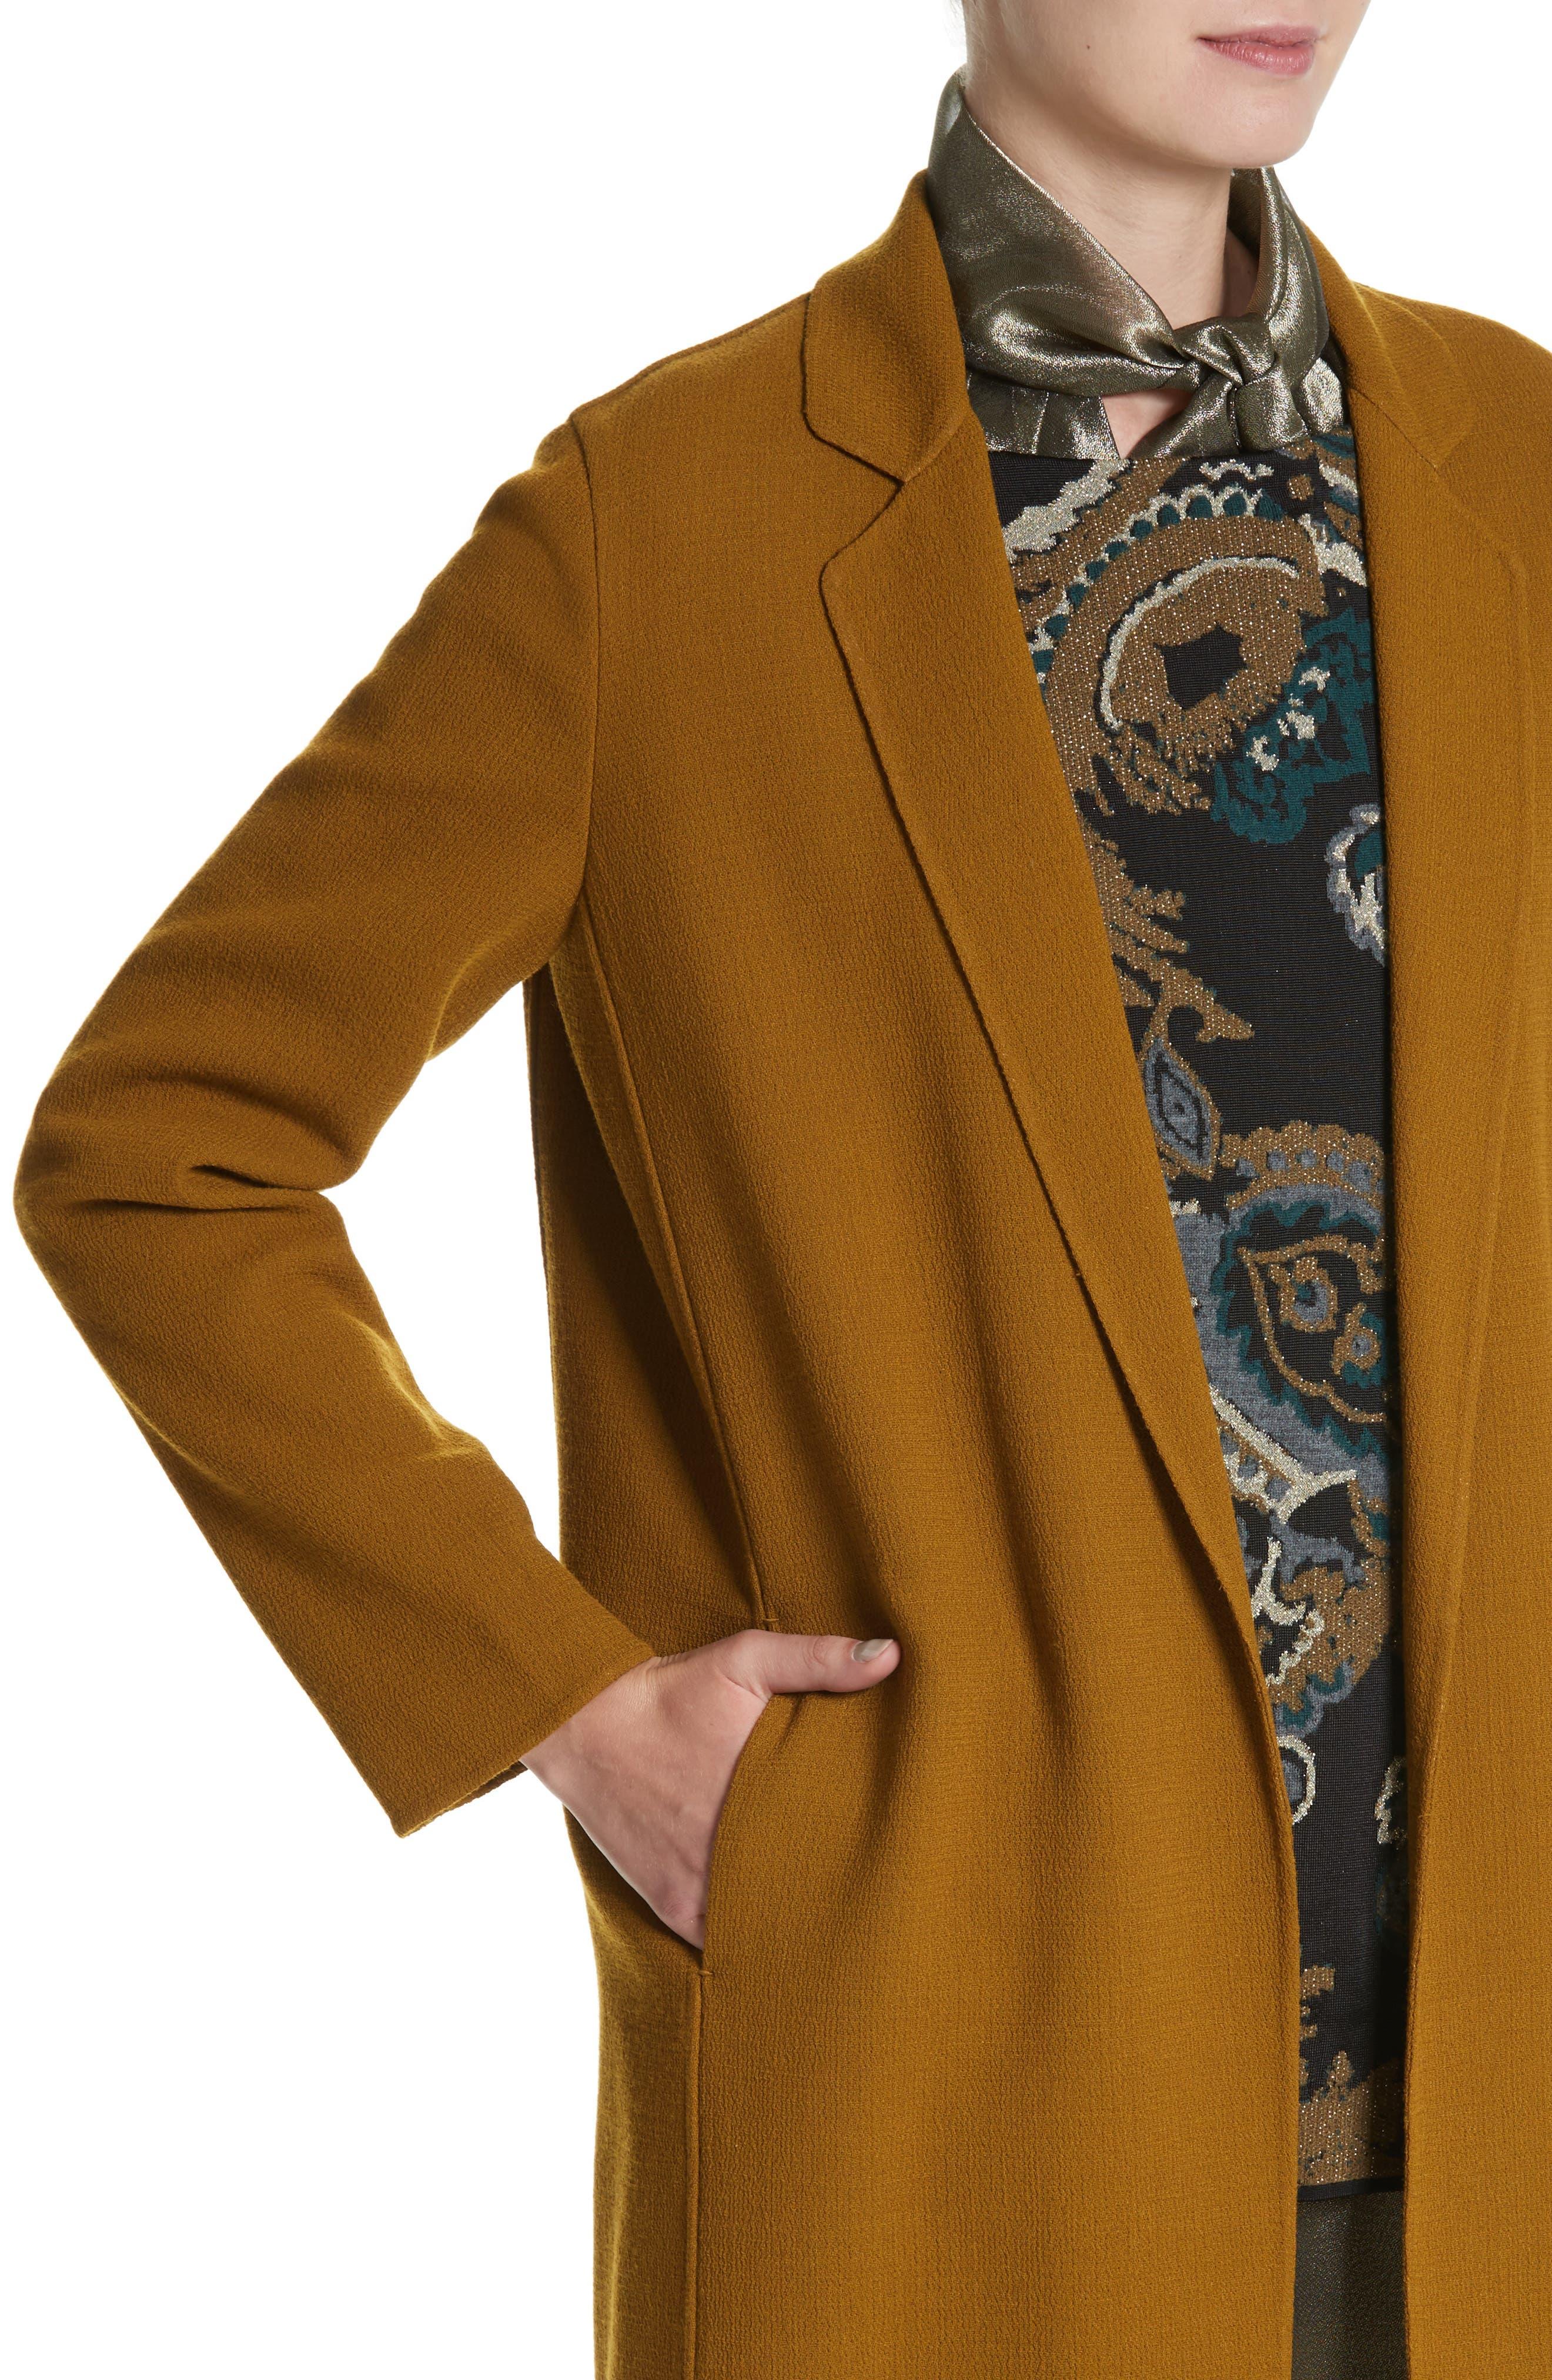 Jolina Nouveau Crepe Jacket,                             Alternate thumbnail 4, color,                             358